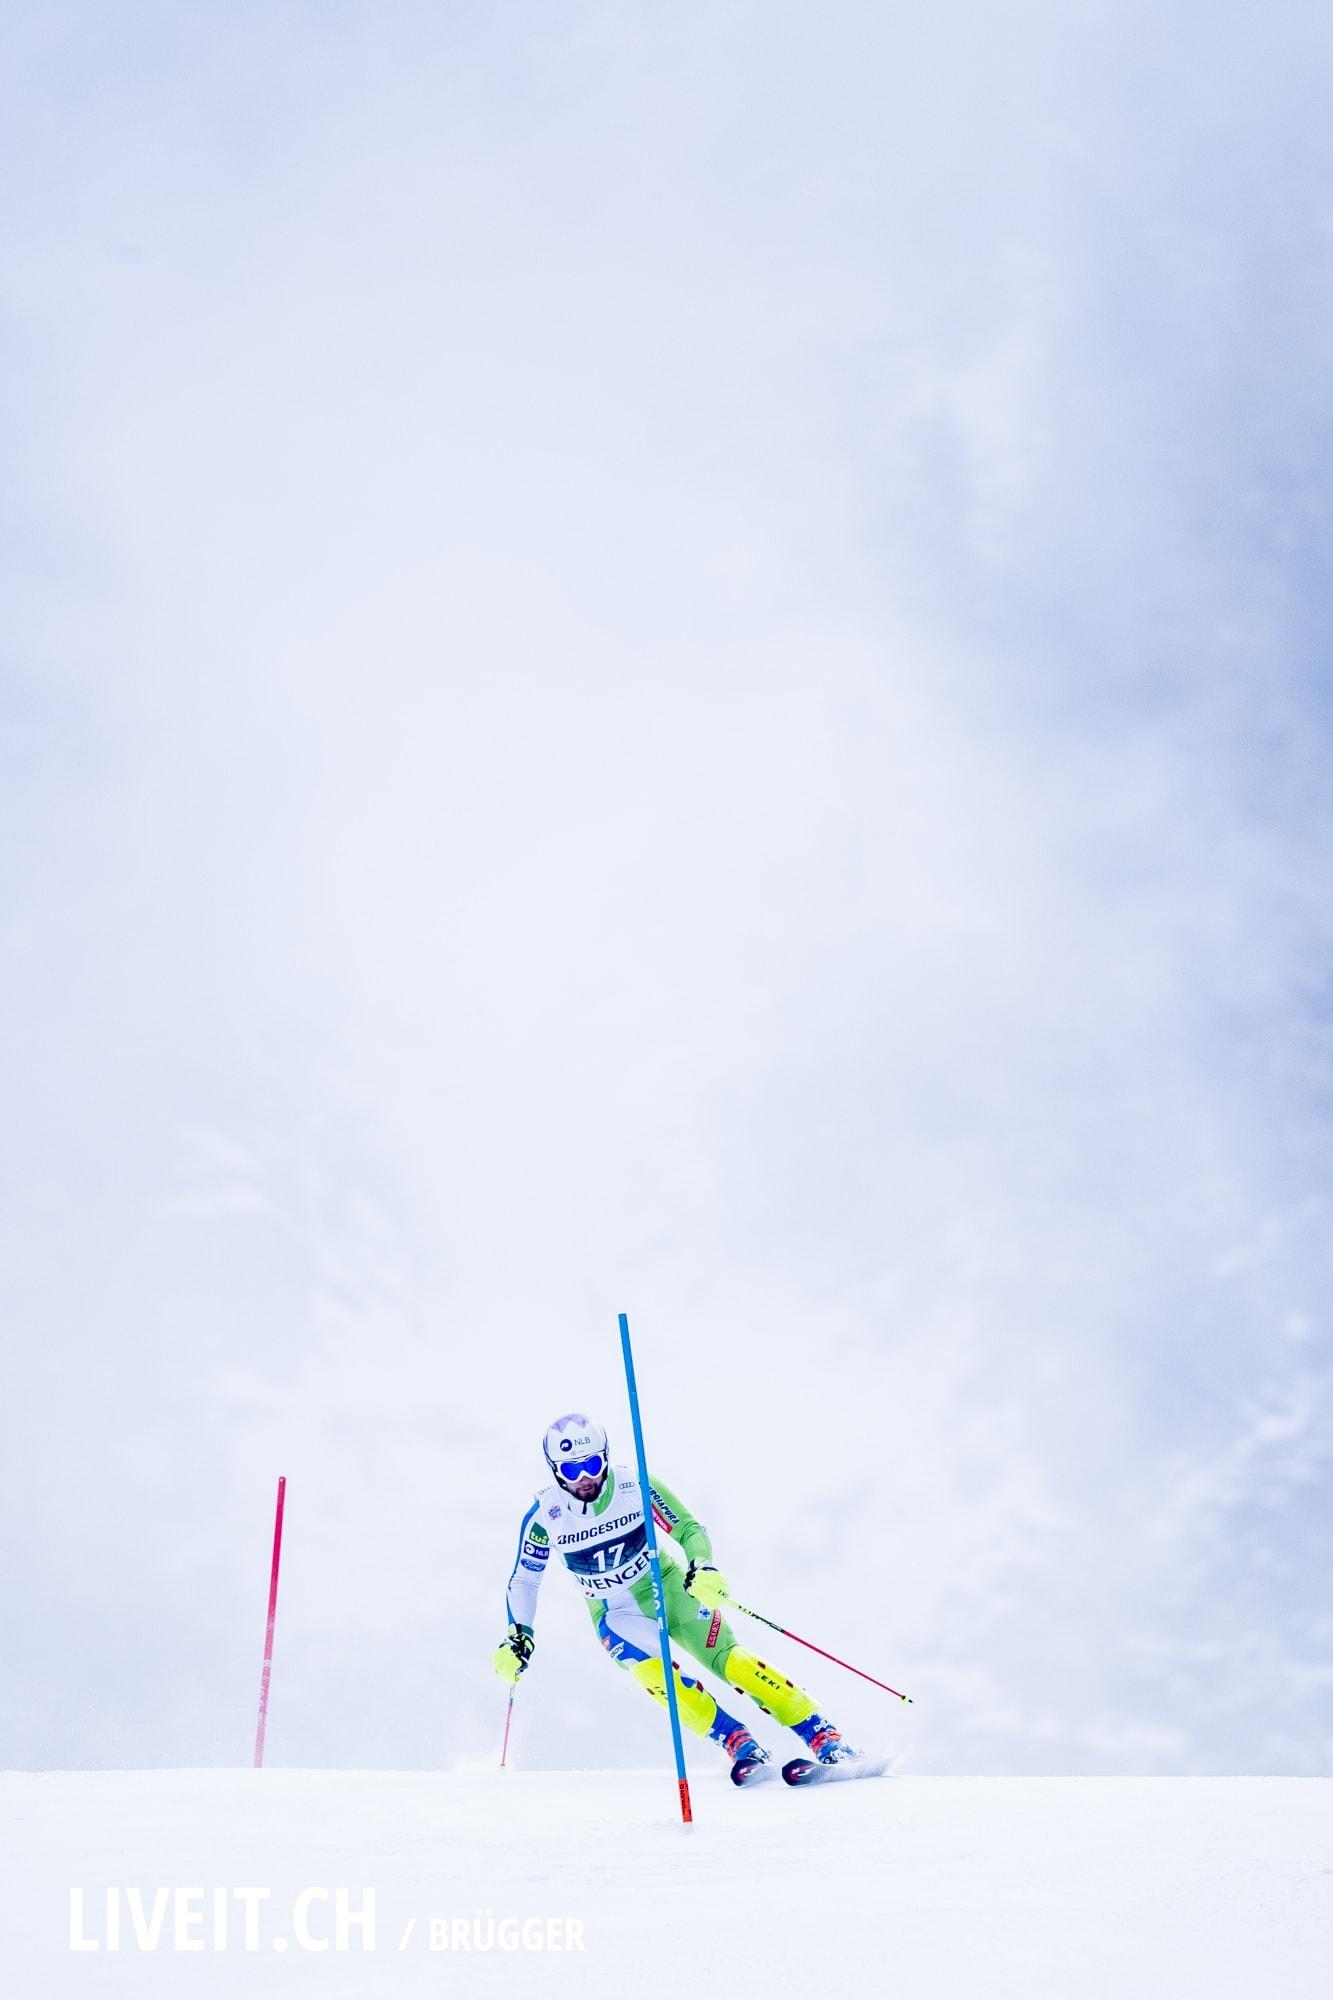 Martin Cater (SLO) fotografiert am Freitag, 18. Januar 2019 am Lauberhornrennen in der Disziplin: Slalom Alpine Kombination. (Fotografiert von Dominic Bruegger liveit.ch)